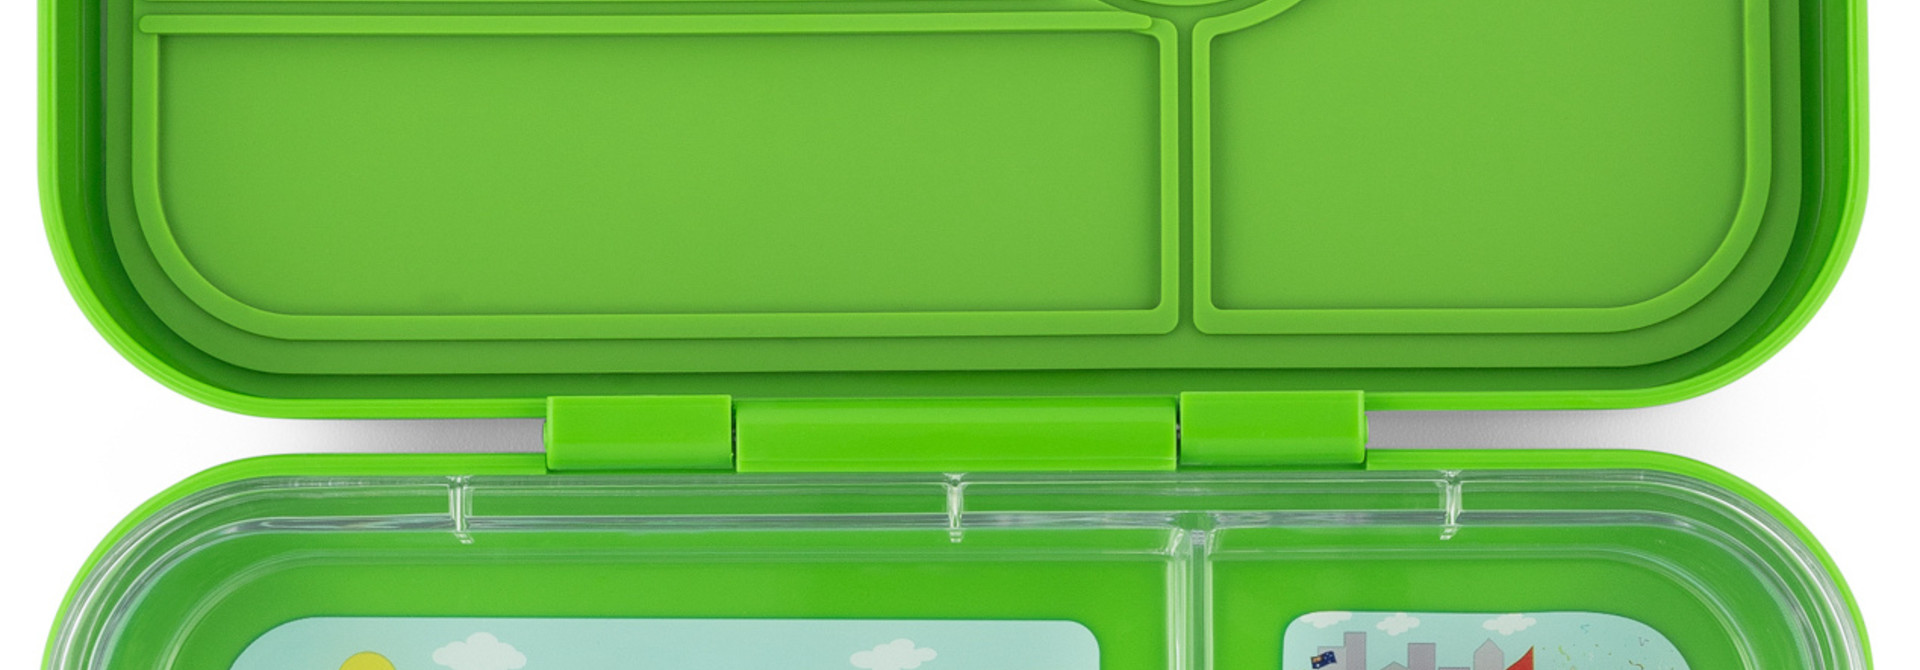 Yumbox Tapas XL 4-sections Go green / Bike race tray